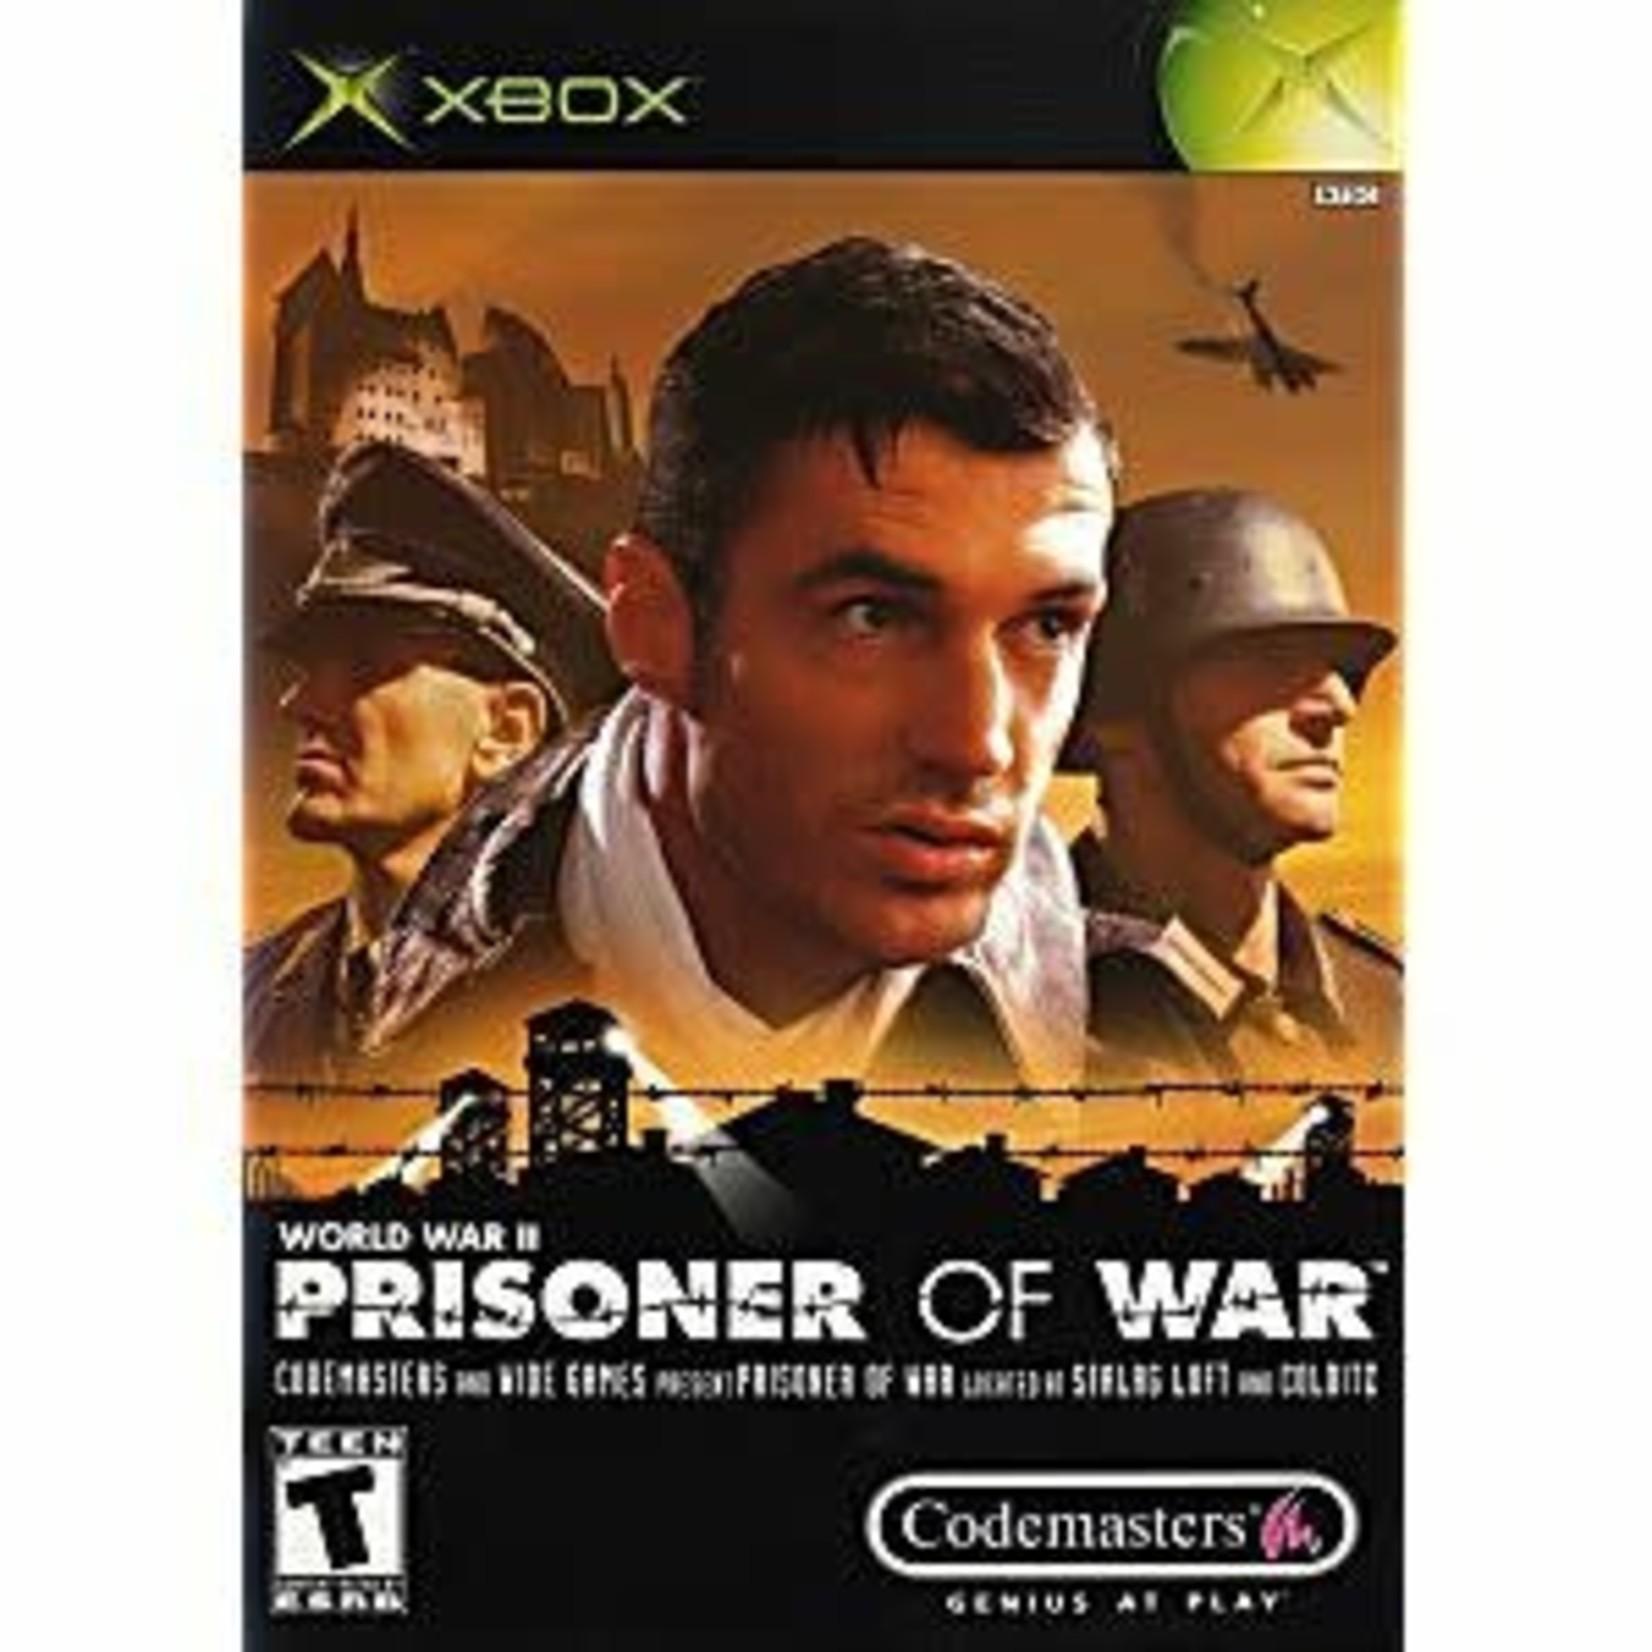 XBU-Prisoner Of War